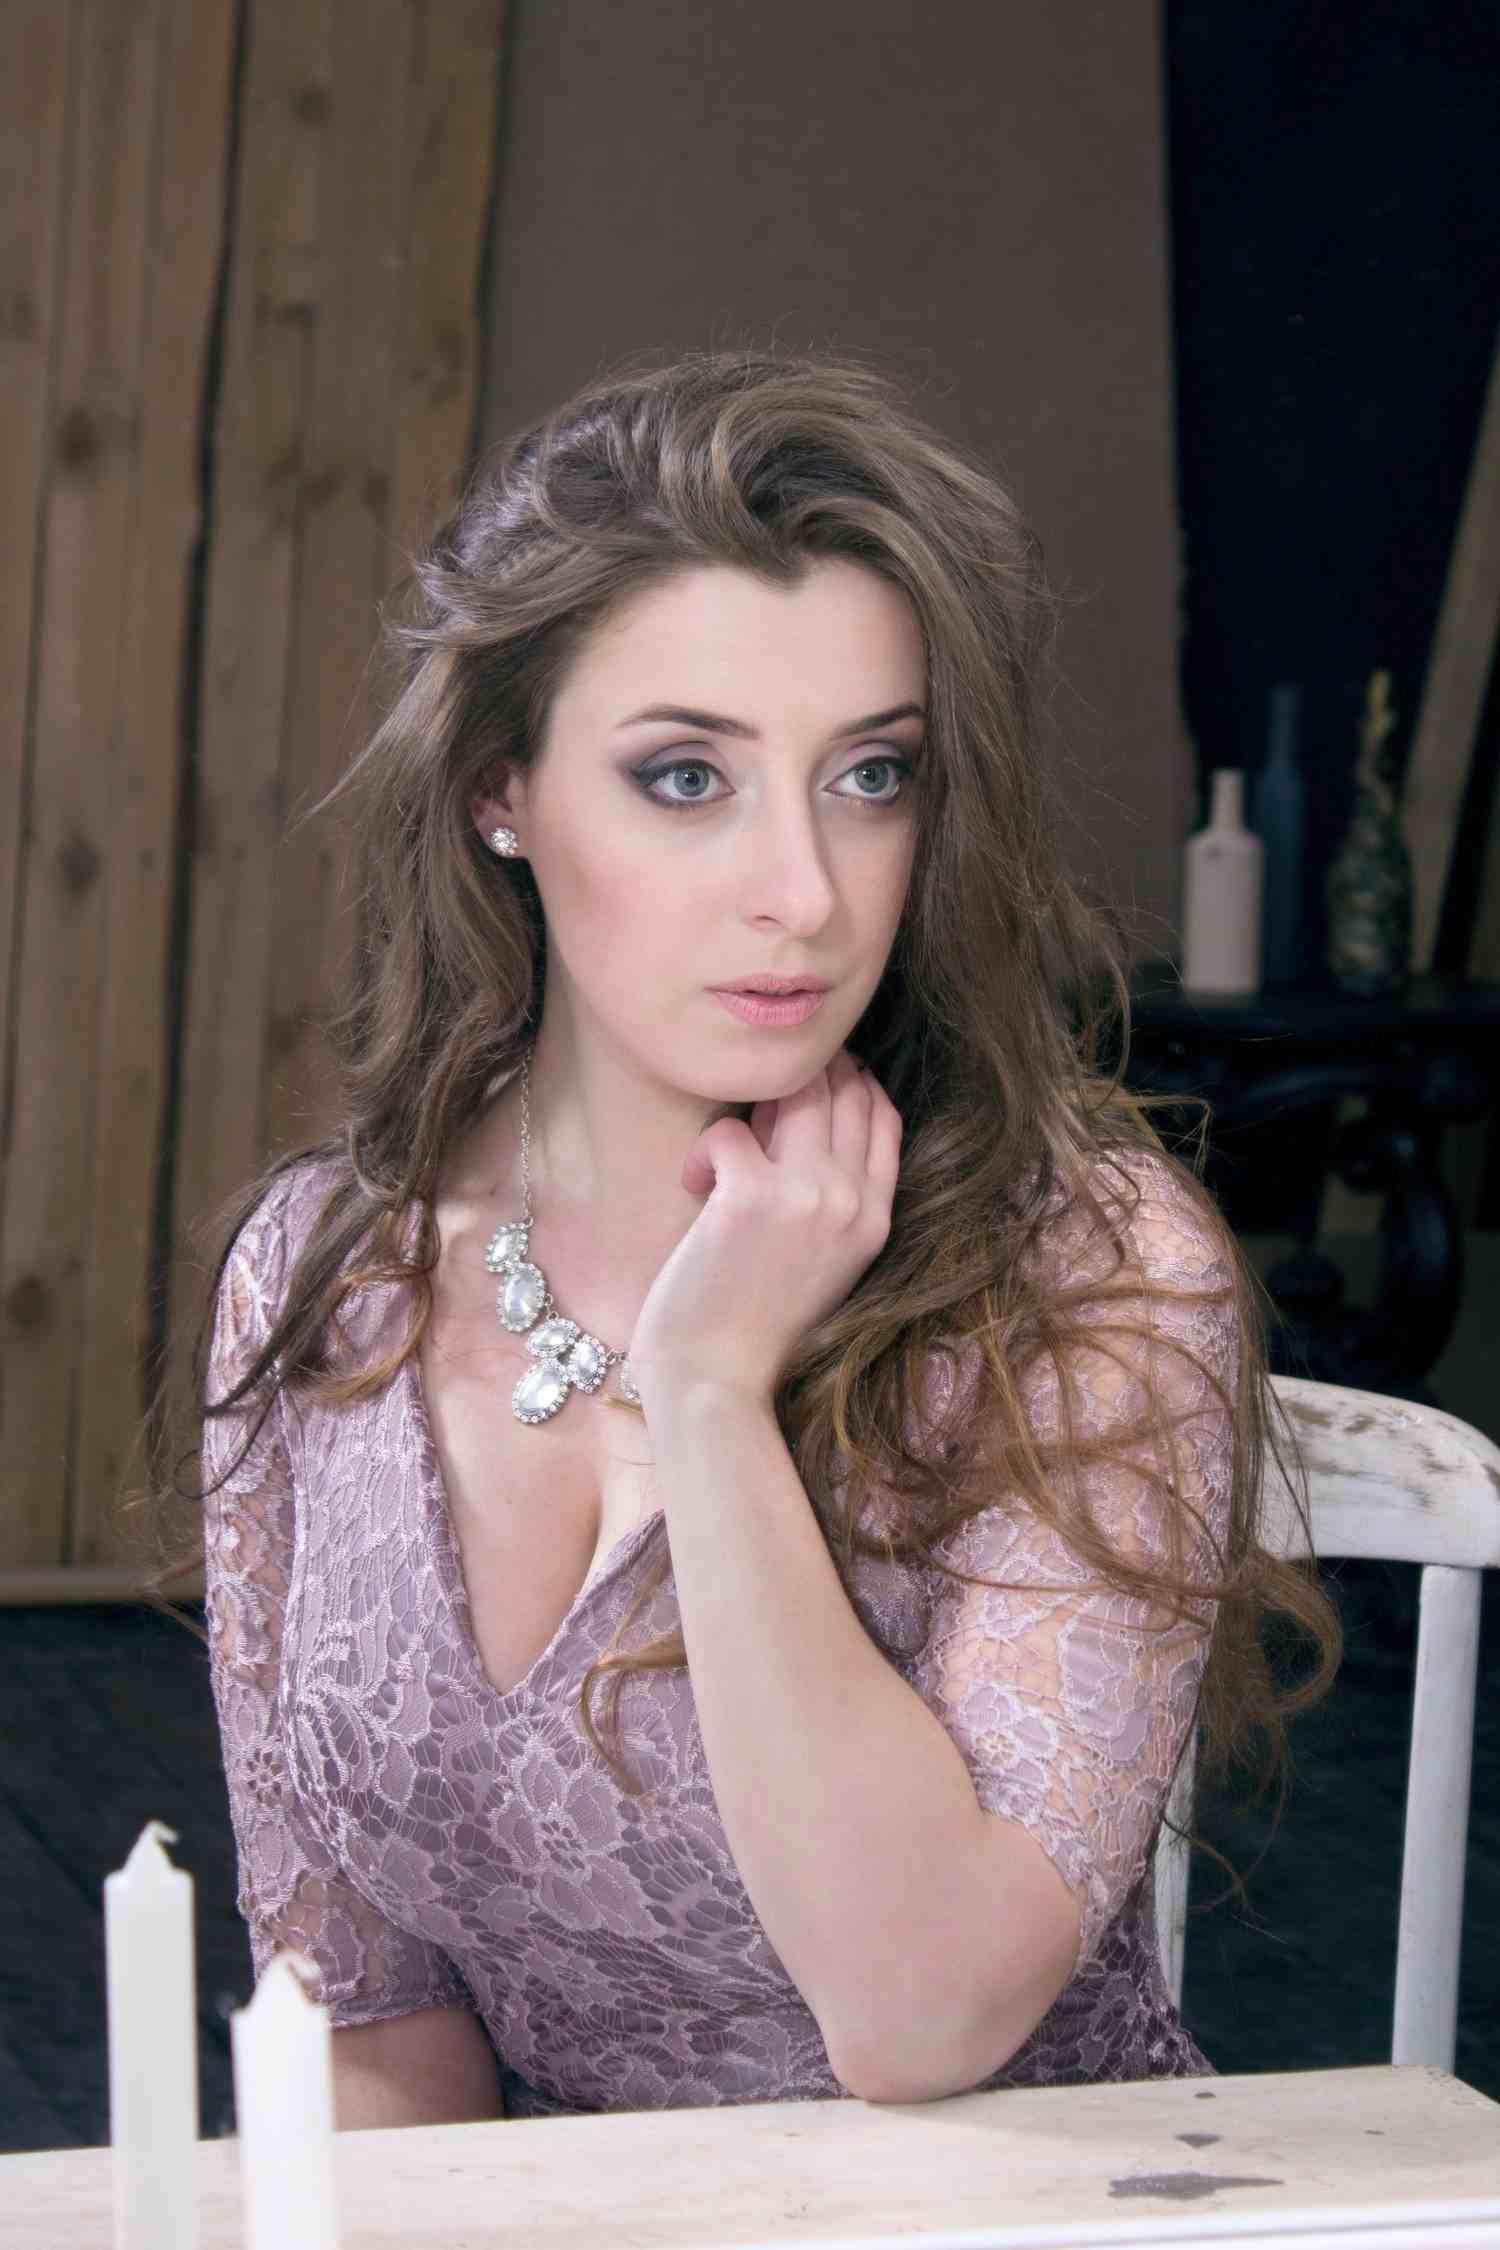 Ladyraina